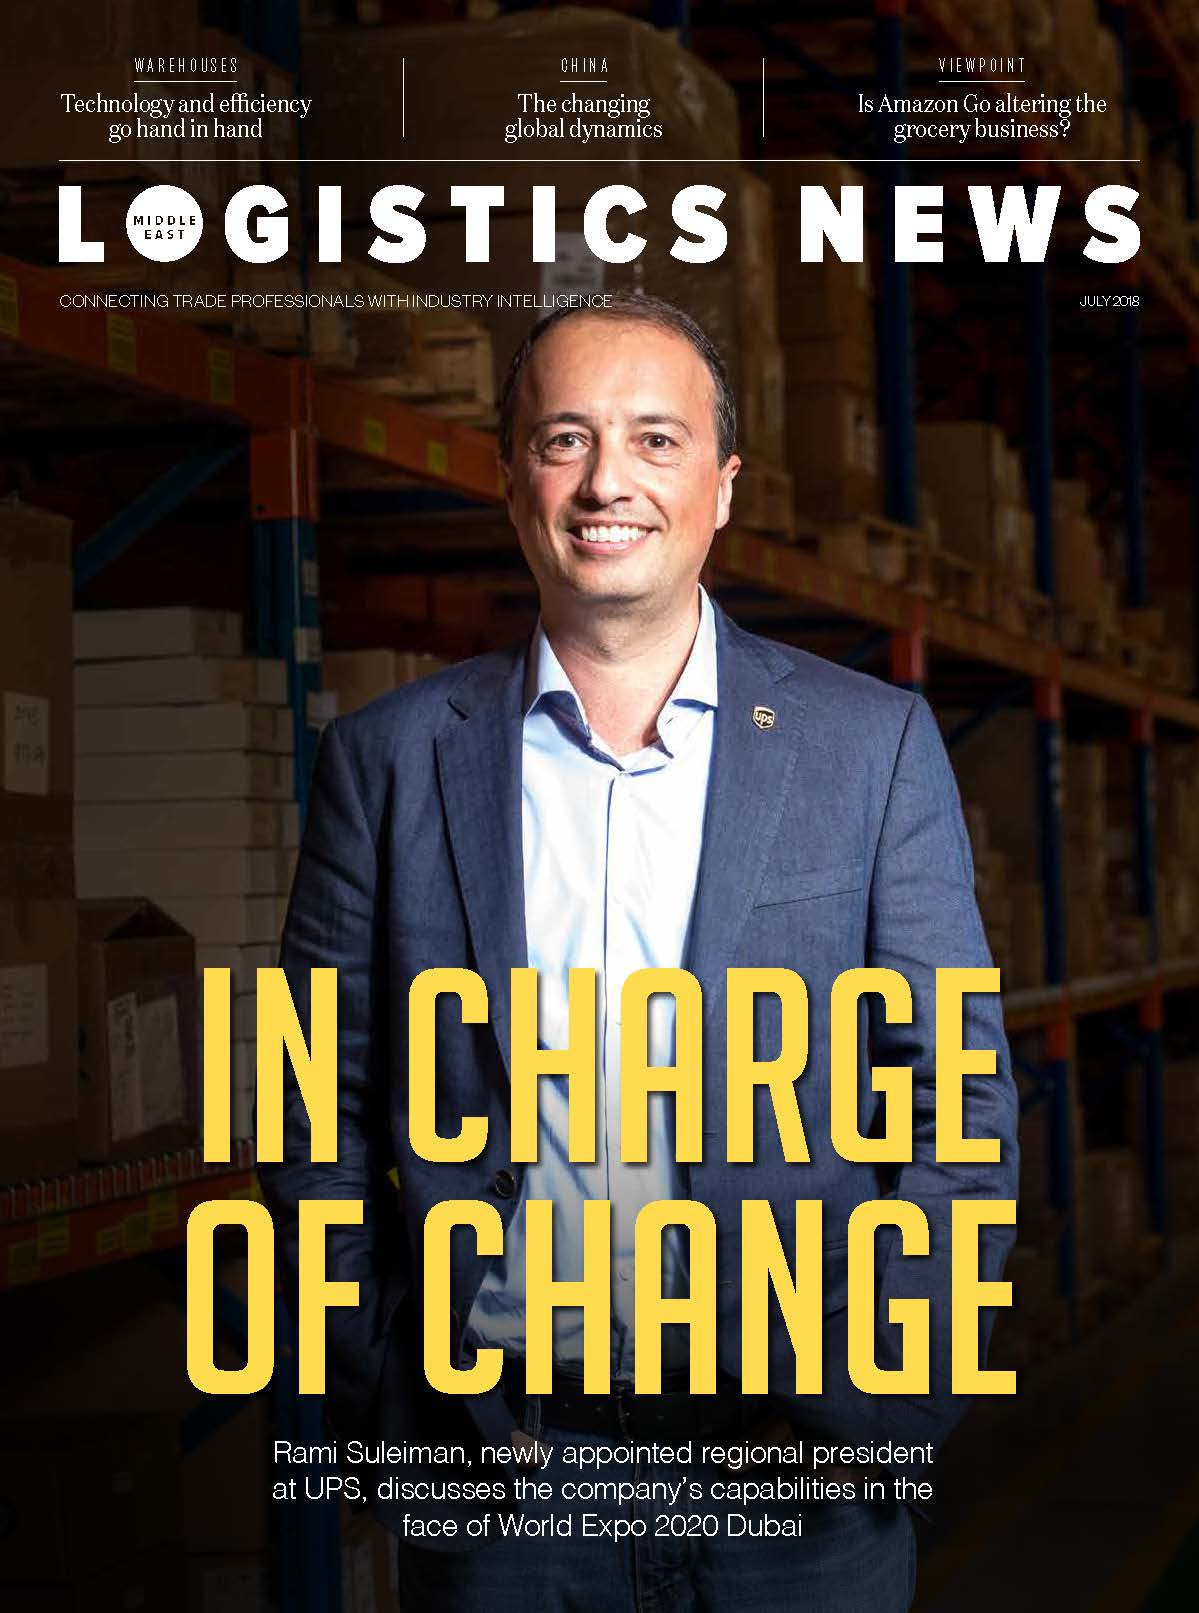 https://www.cbnme.com/magazines/logistics-news-me-july-2018/